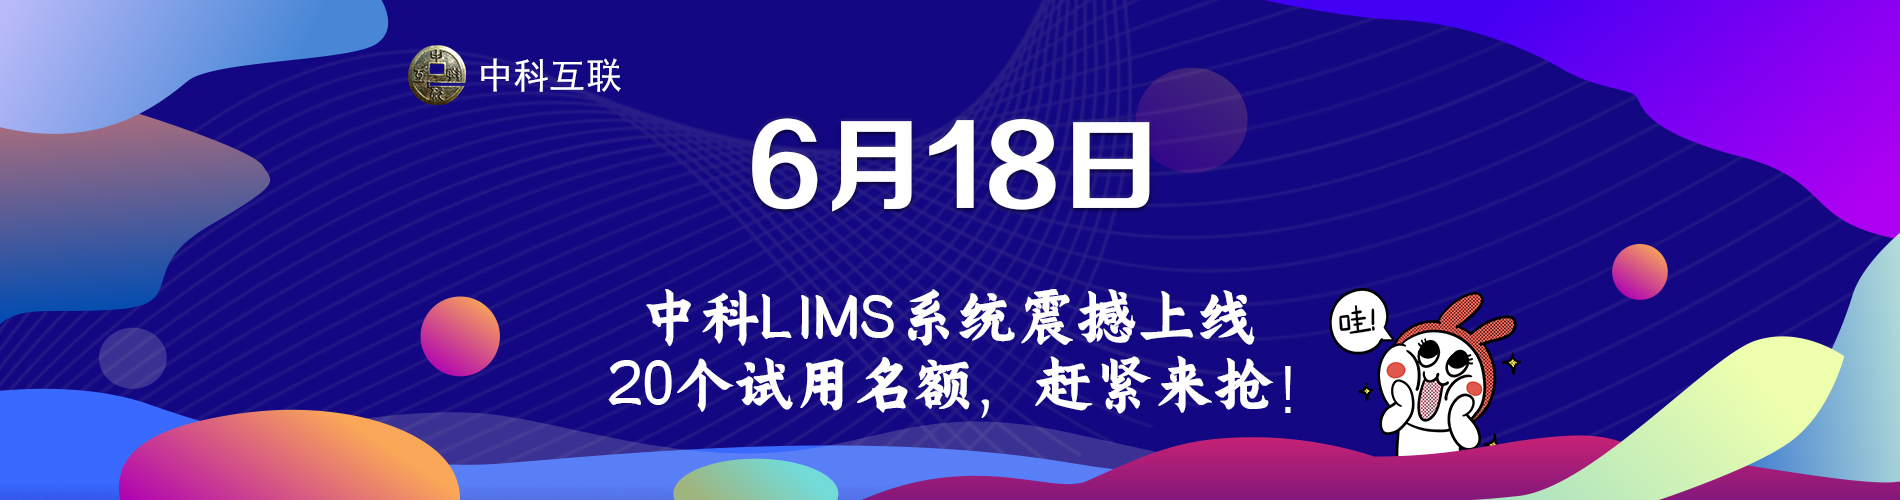 LIMS系统